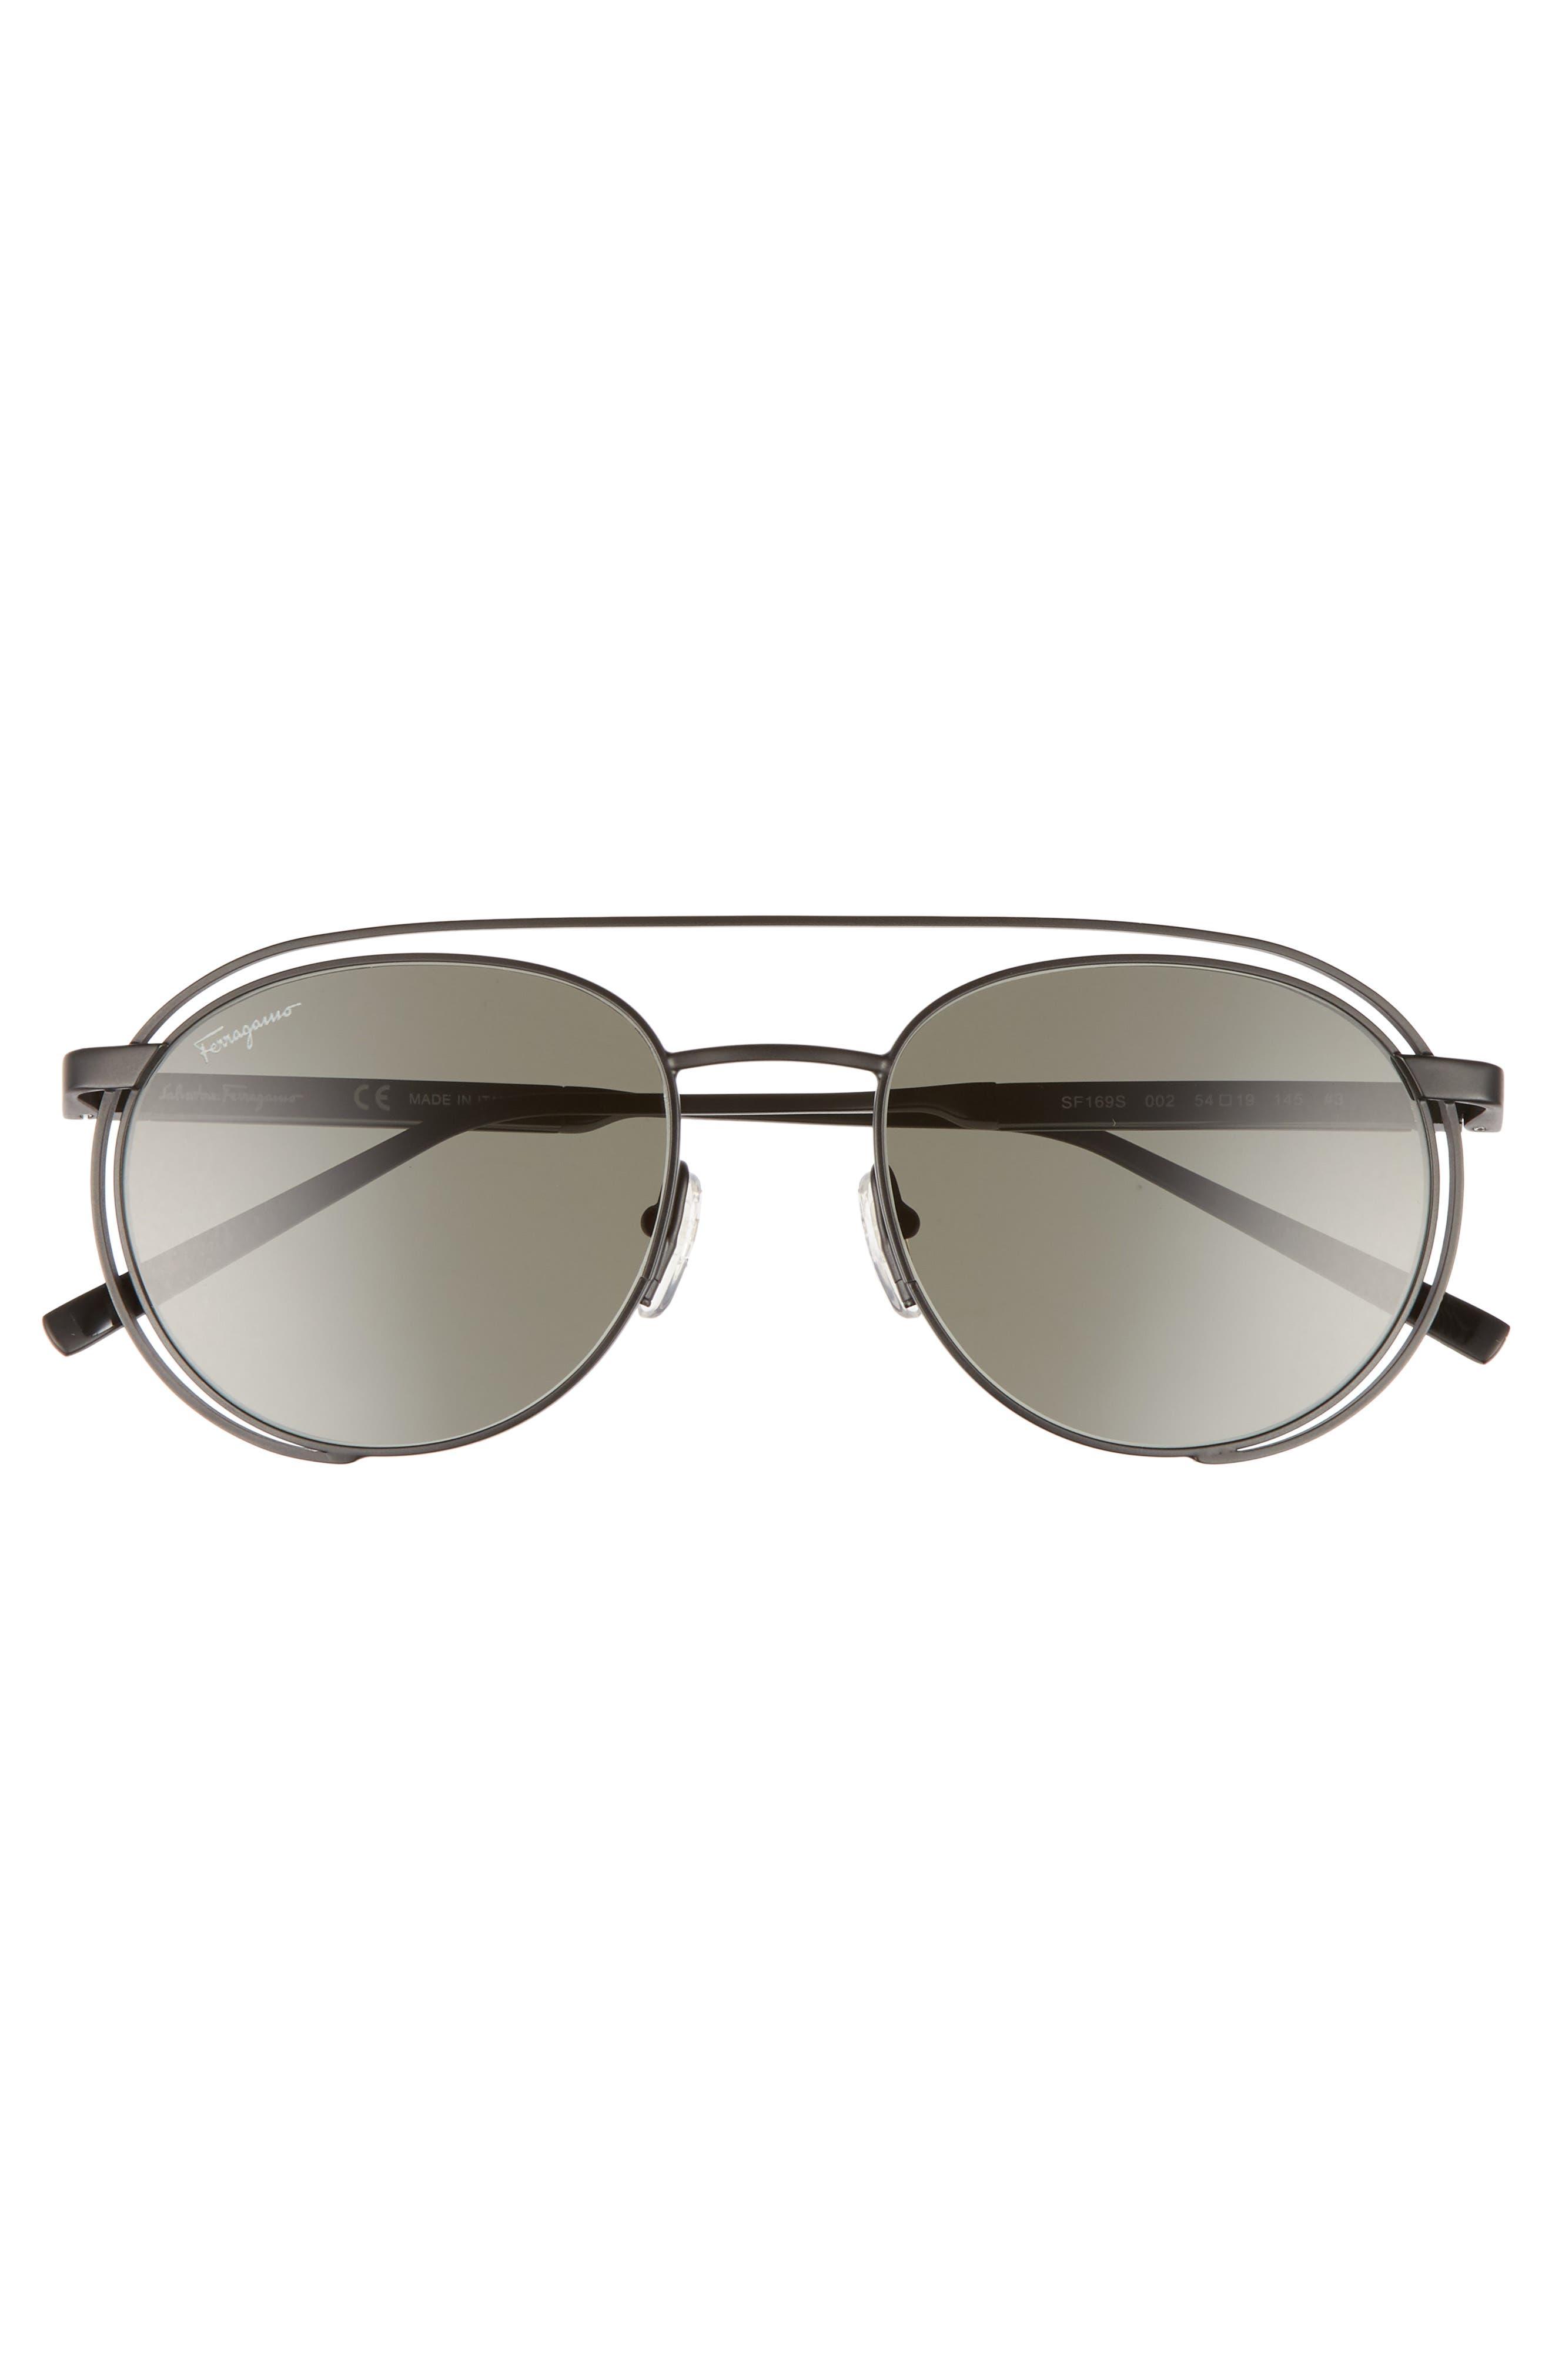 SALVATORE FERRAGAMO, 54mm Round Sunglasses, Alternate thumbnail 2, color, MATTE BLACK